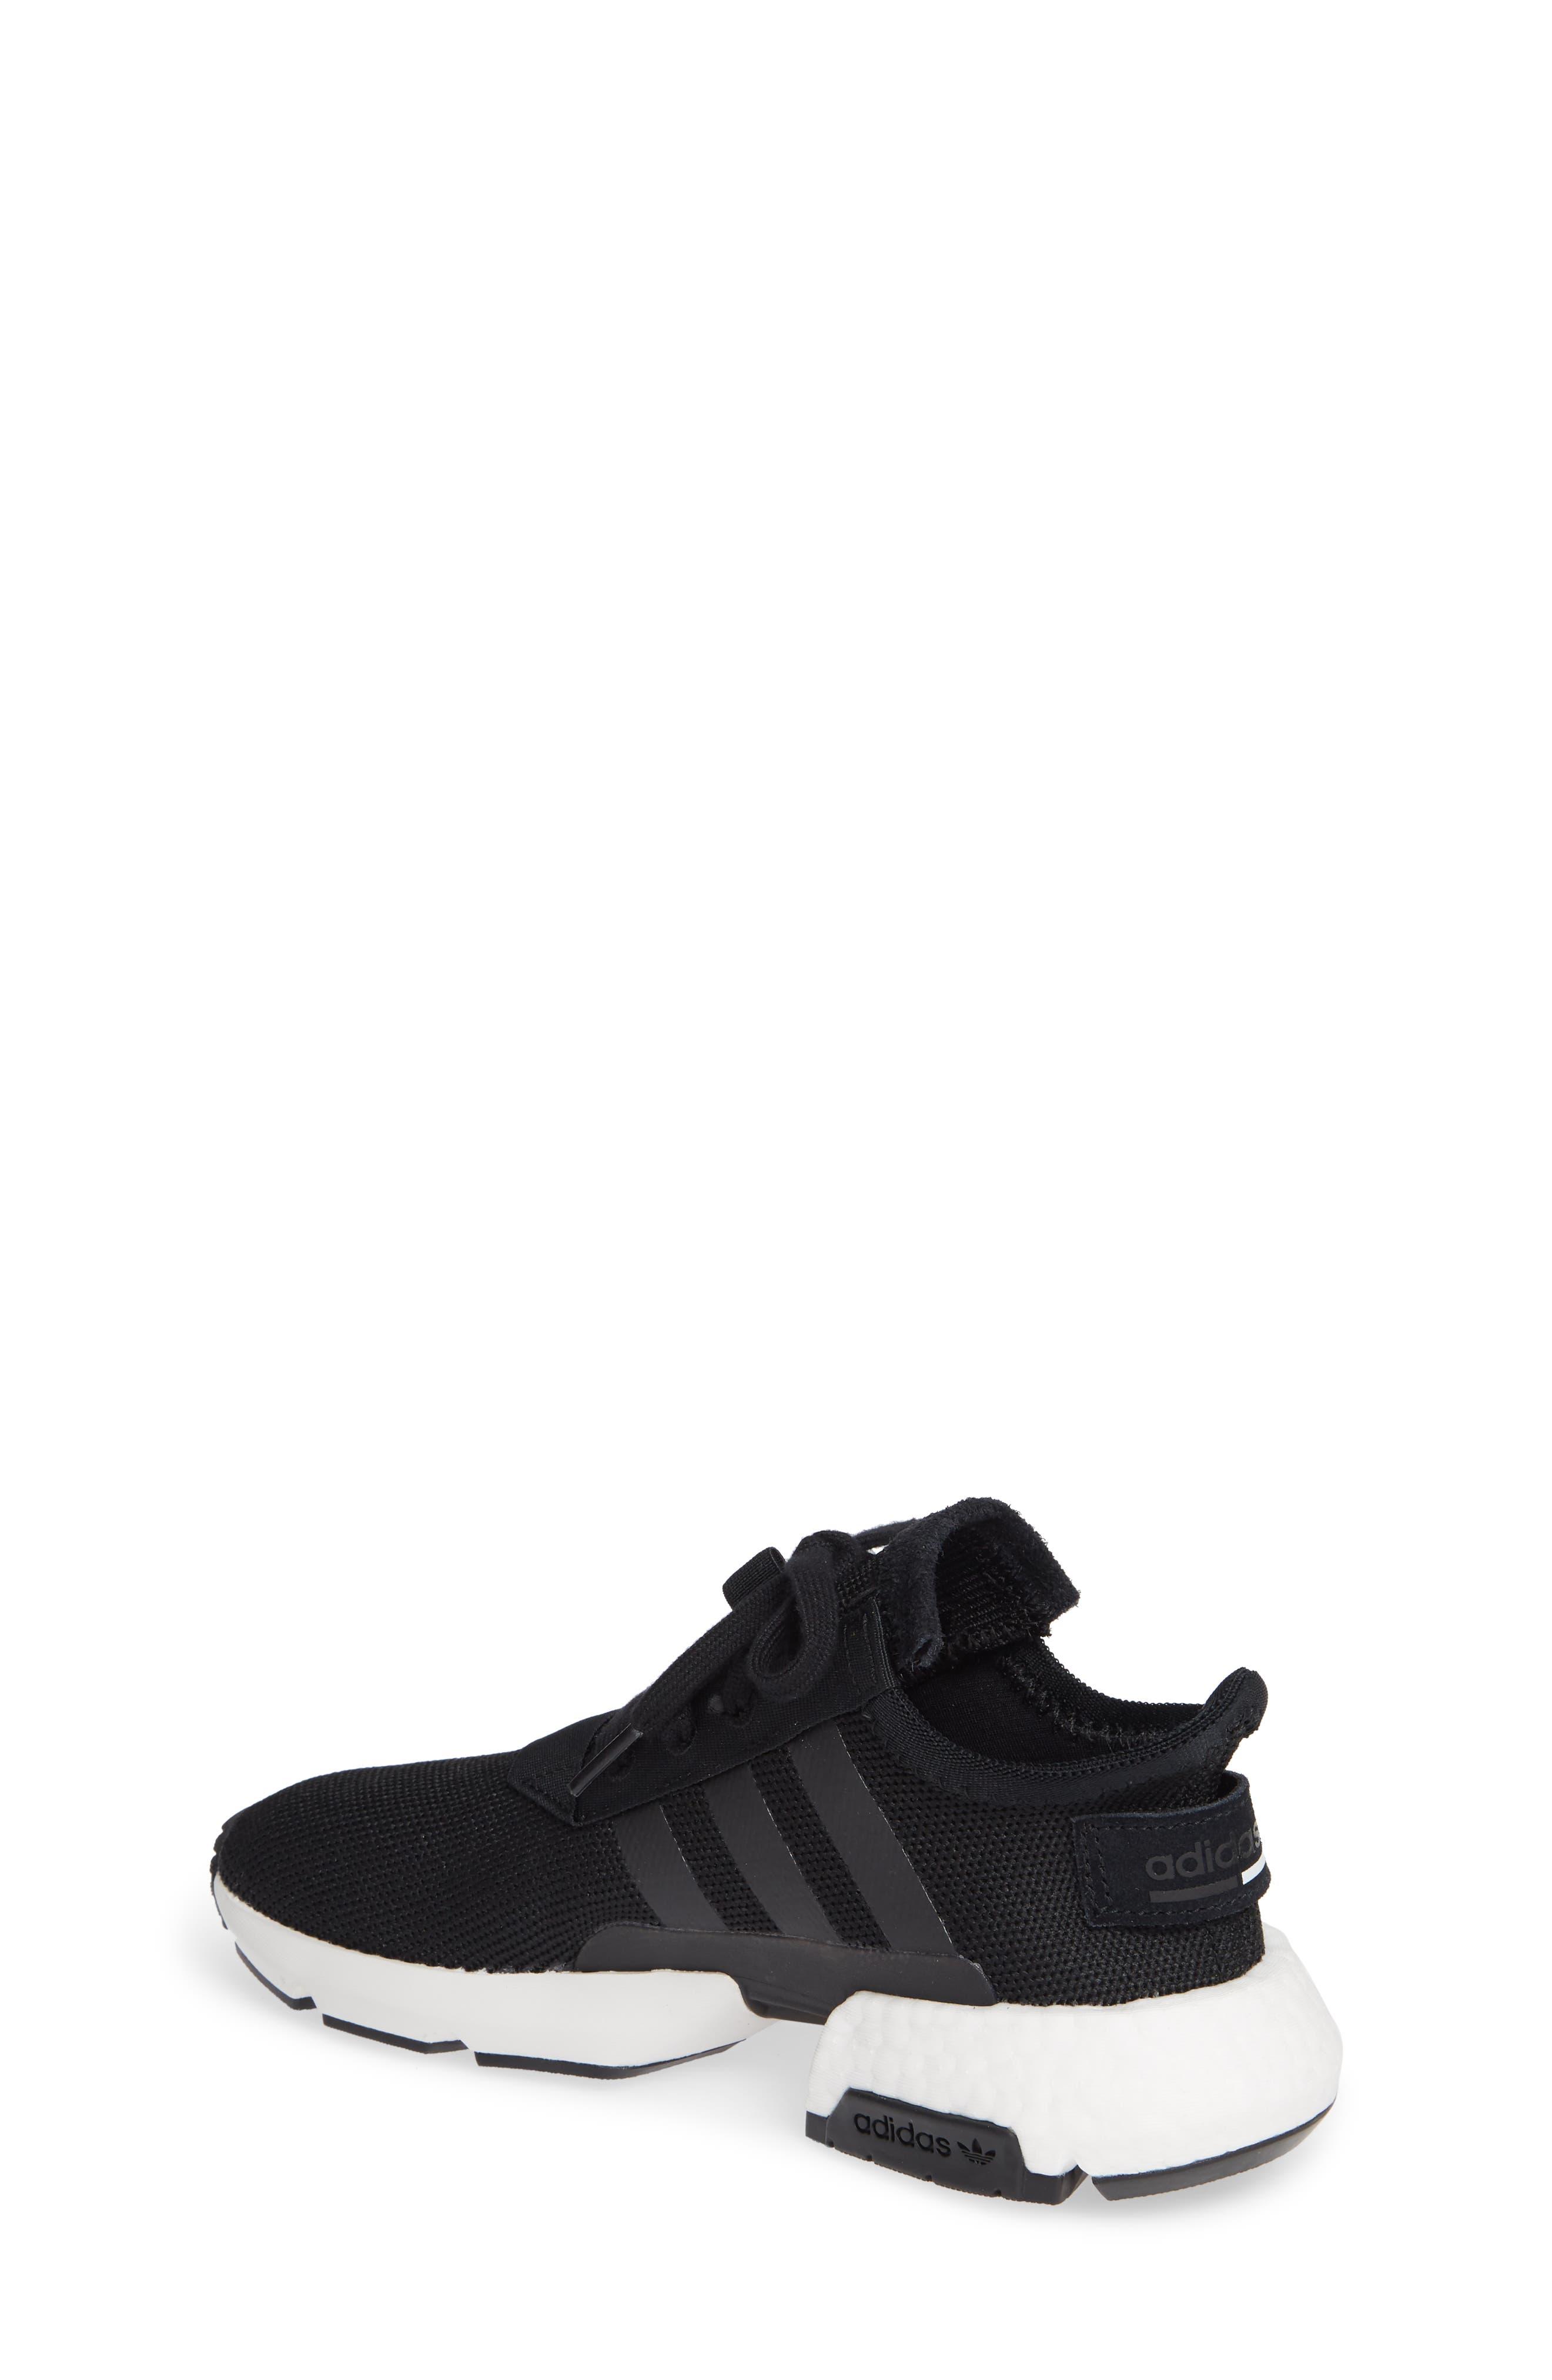 POD-S3.1 Sneaker,                             Alternate thumbnail 2, color,                             CORE BLACK/ BLACK/ LEGEND IVY